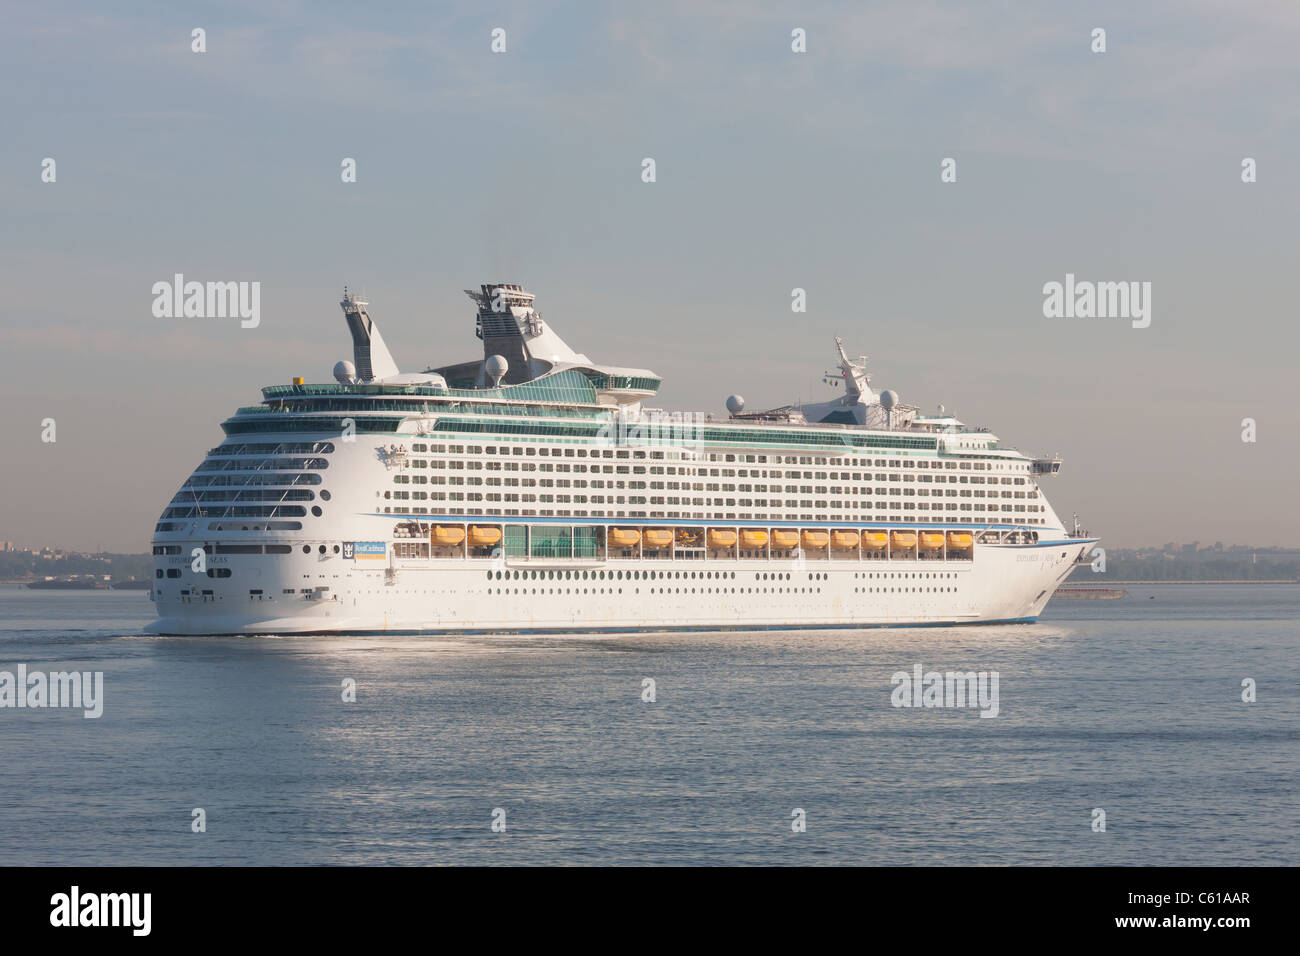 Royal Caribbean Cruise Schiff Explorer of the Seas im Hafen von New York. Stockbild